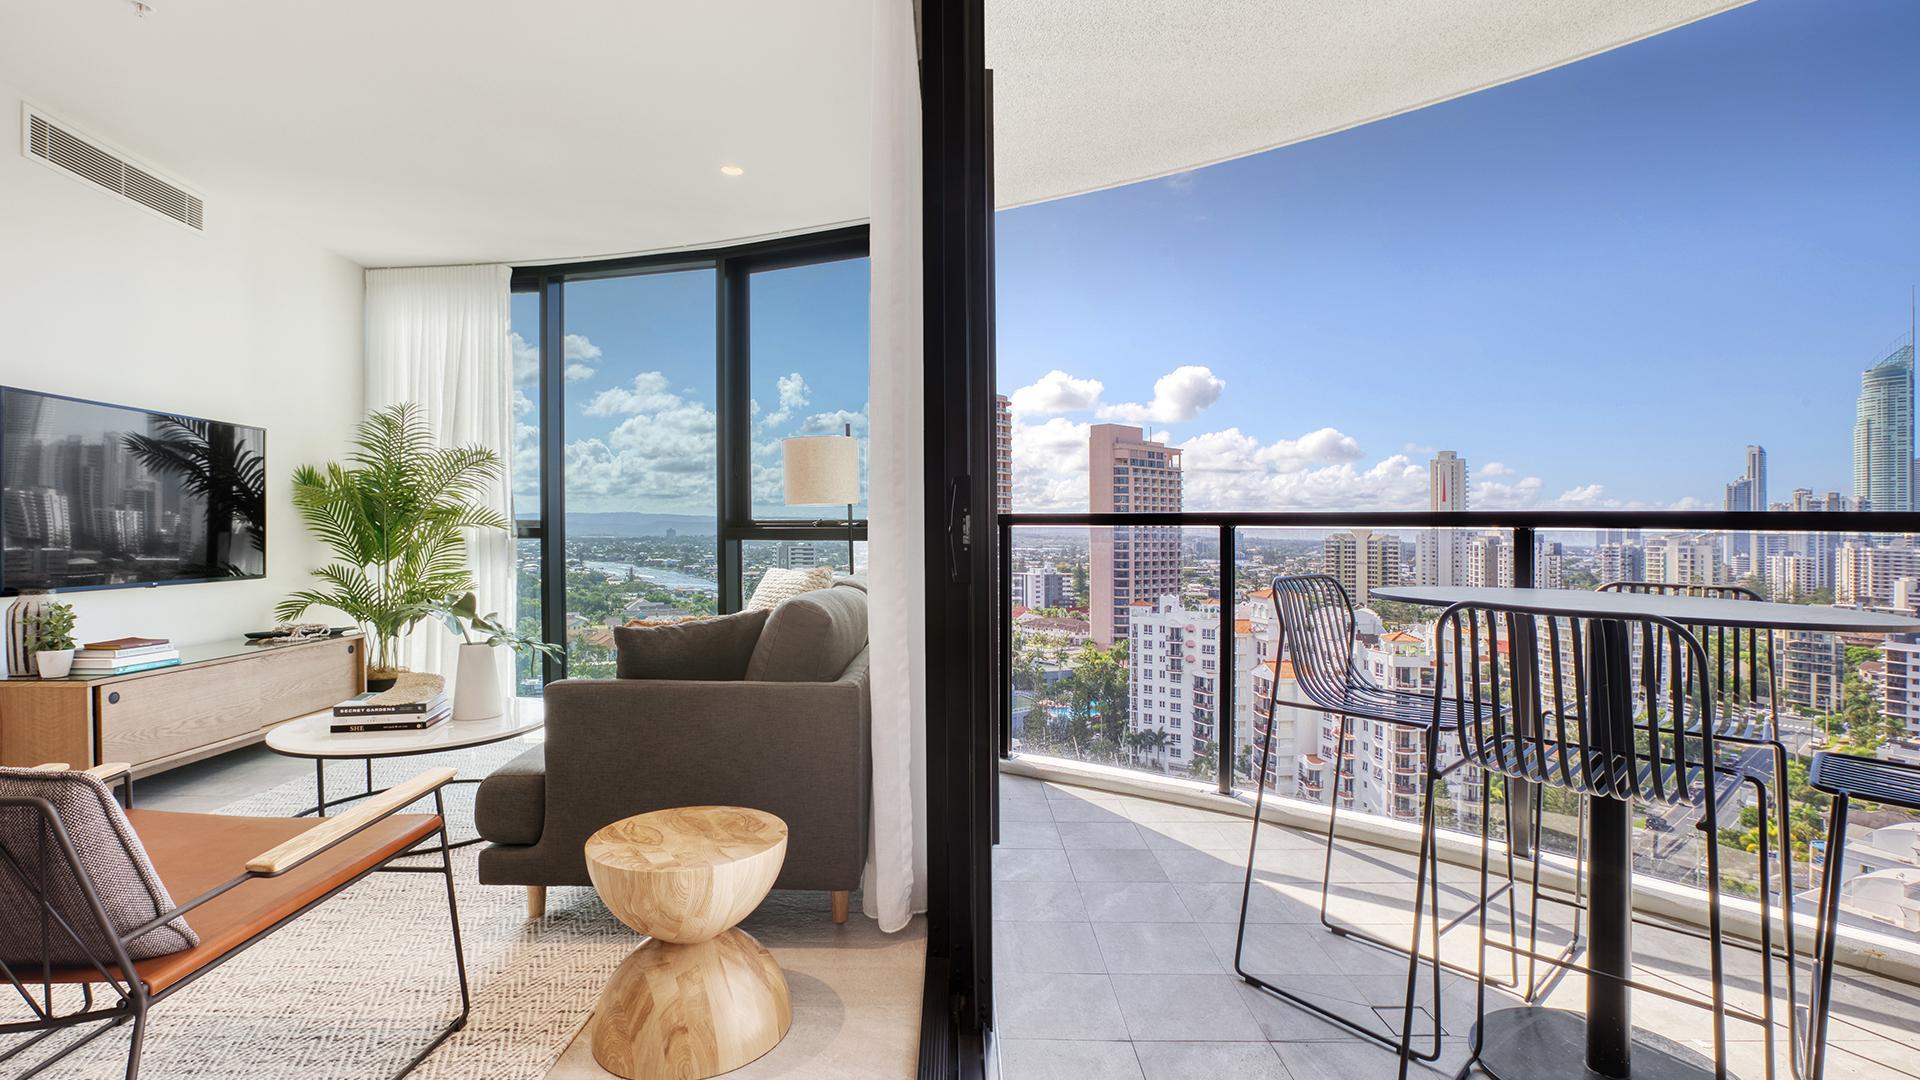 Three-Bedroom Apartment image 1 at Vue Broadbeach by City of Gold Coast, Queensland, Australia